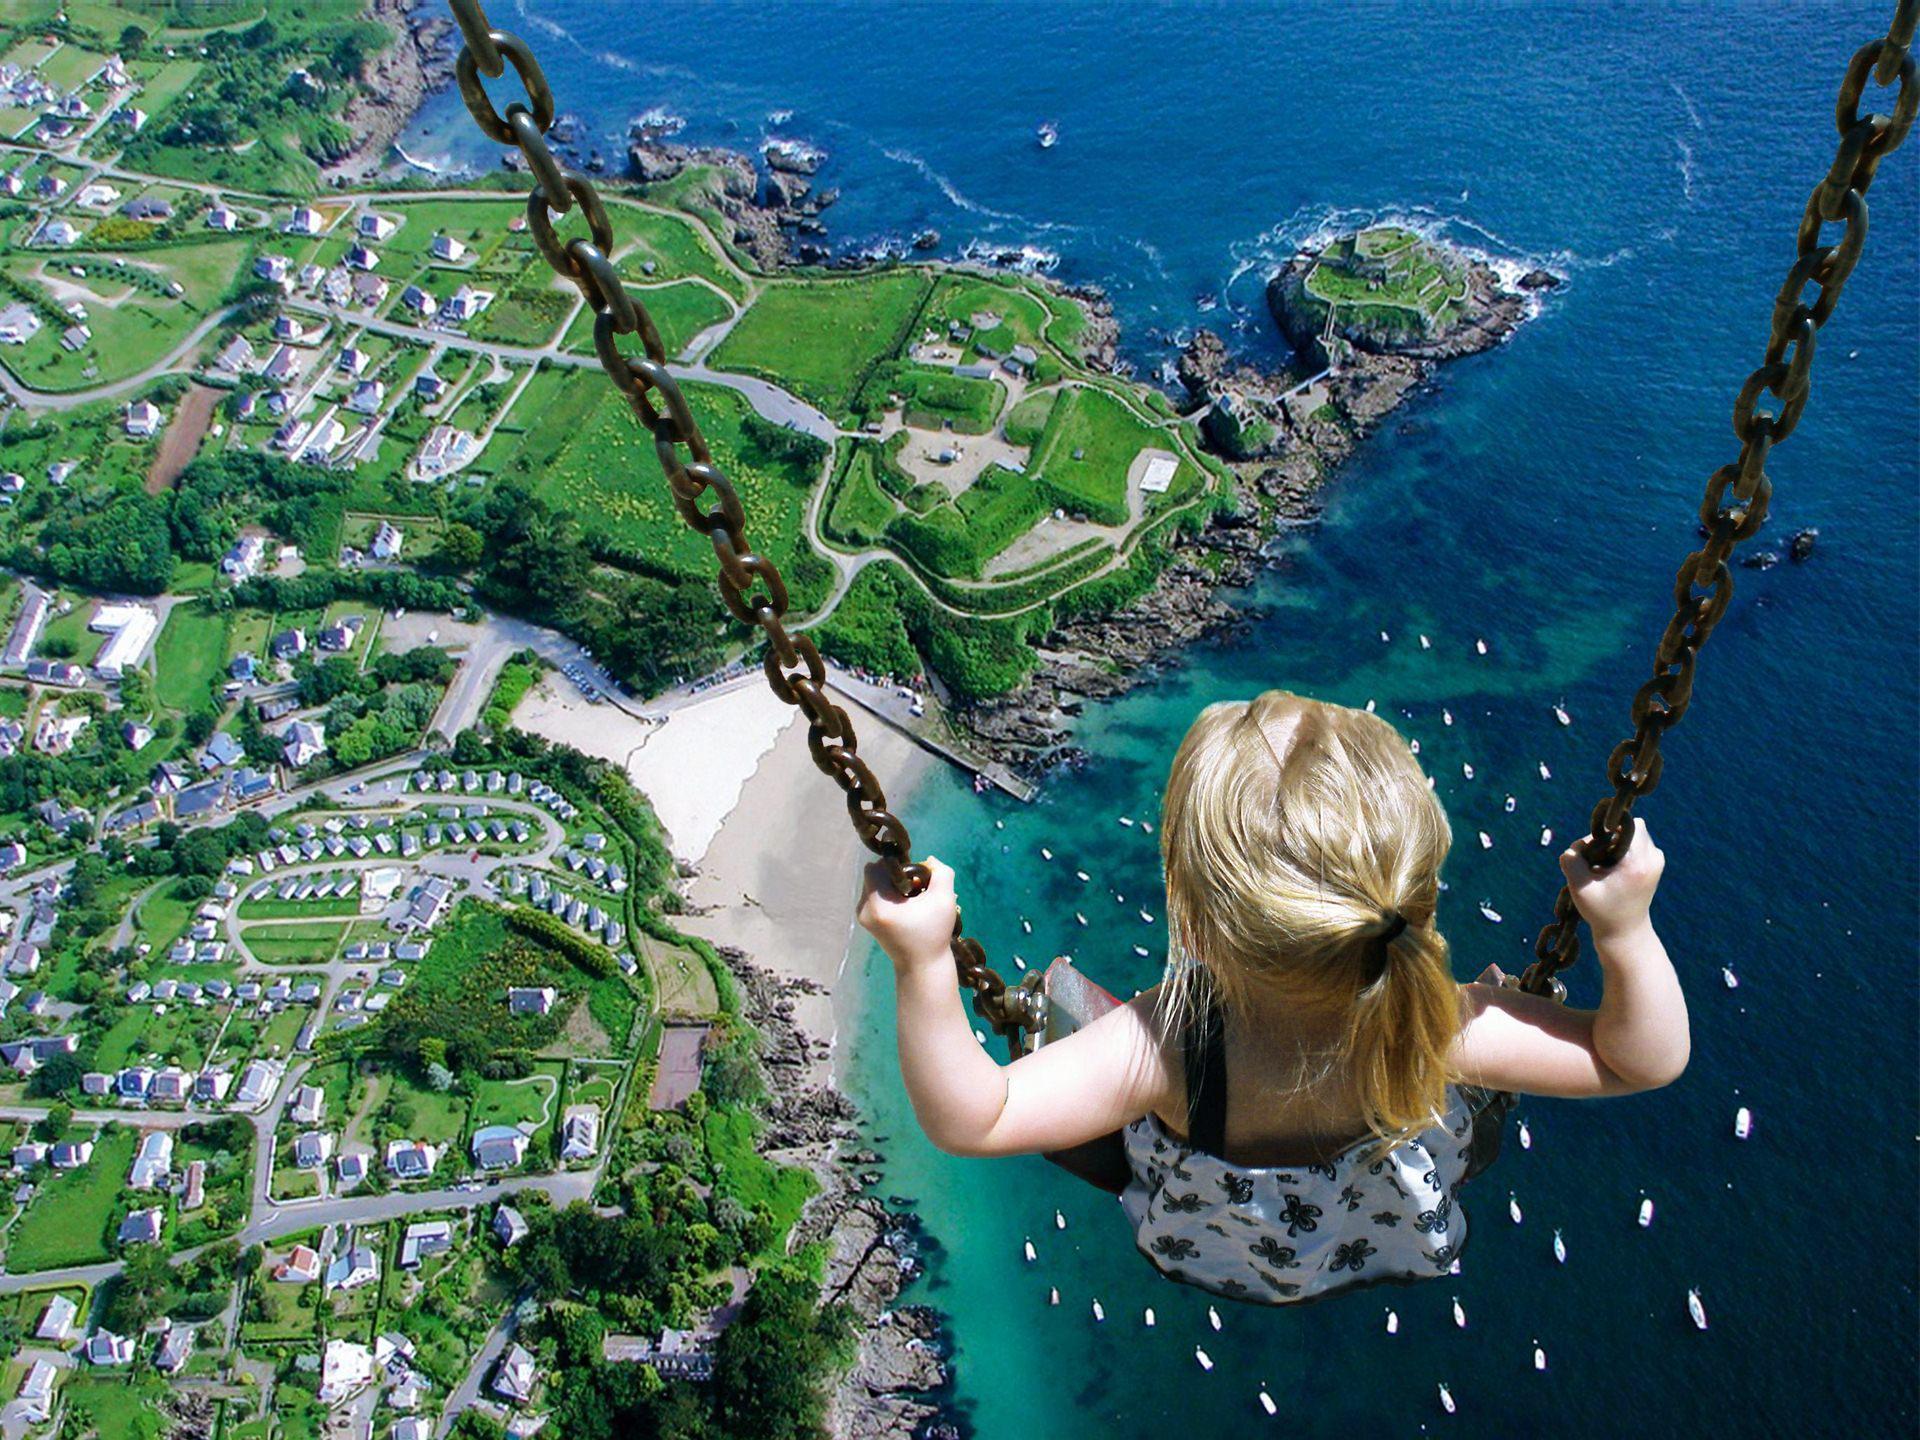 little-girl-on-swing-surreal